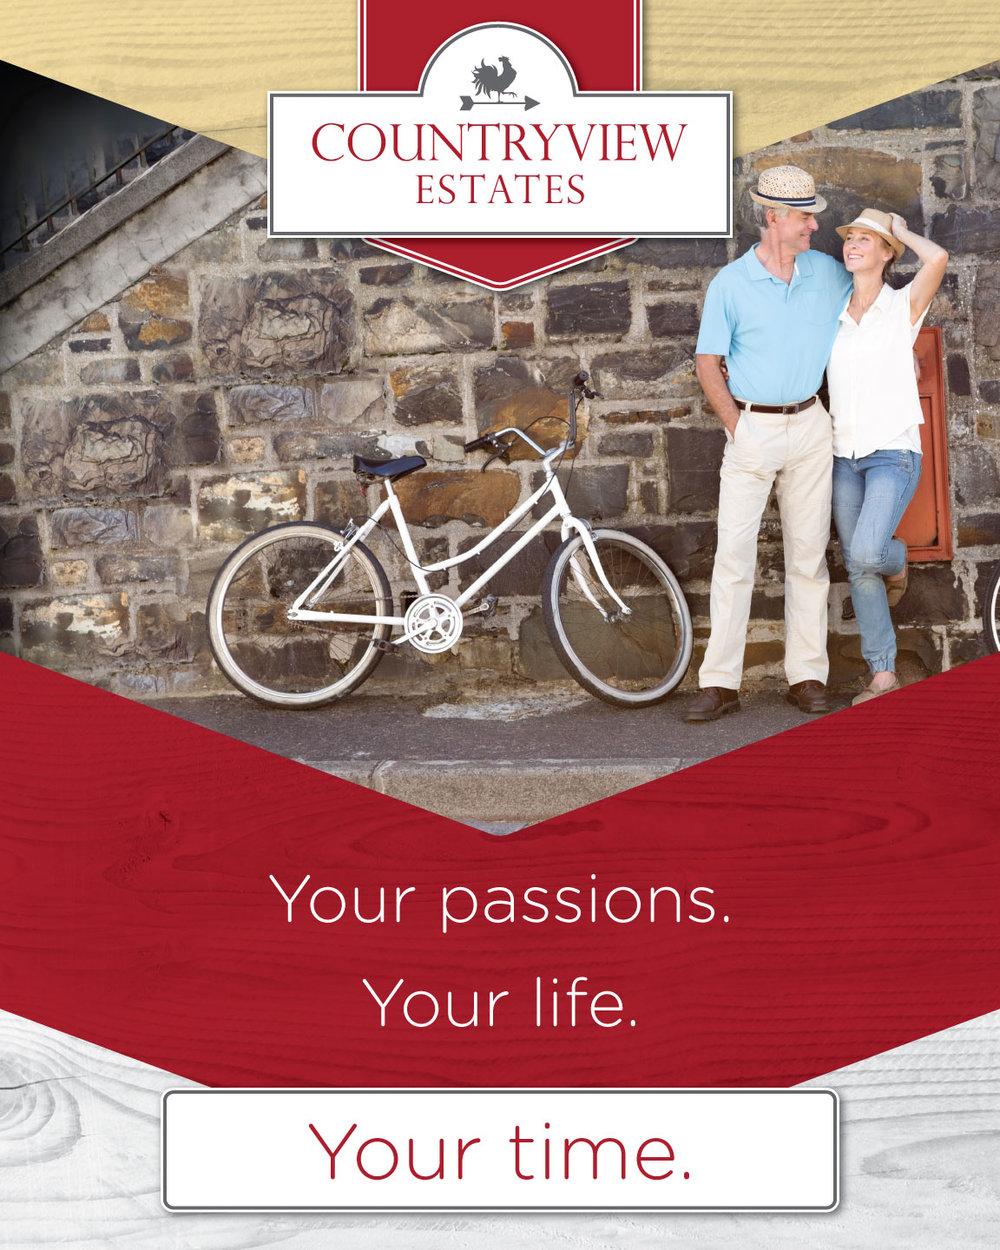 HTA_CountryviewEstates_LifestylePoster_3.jpg